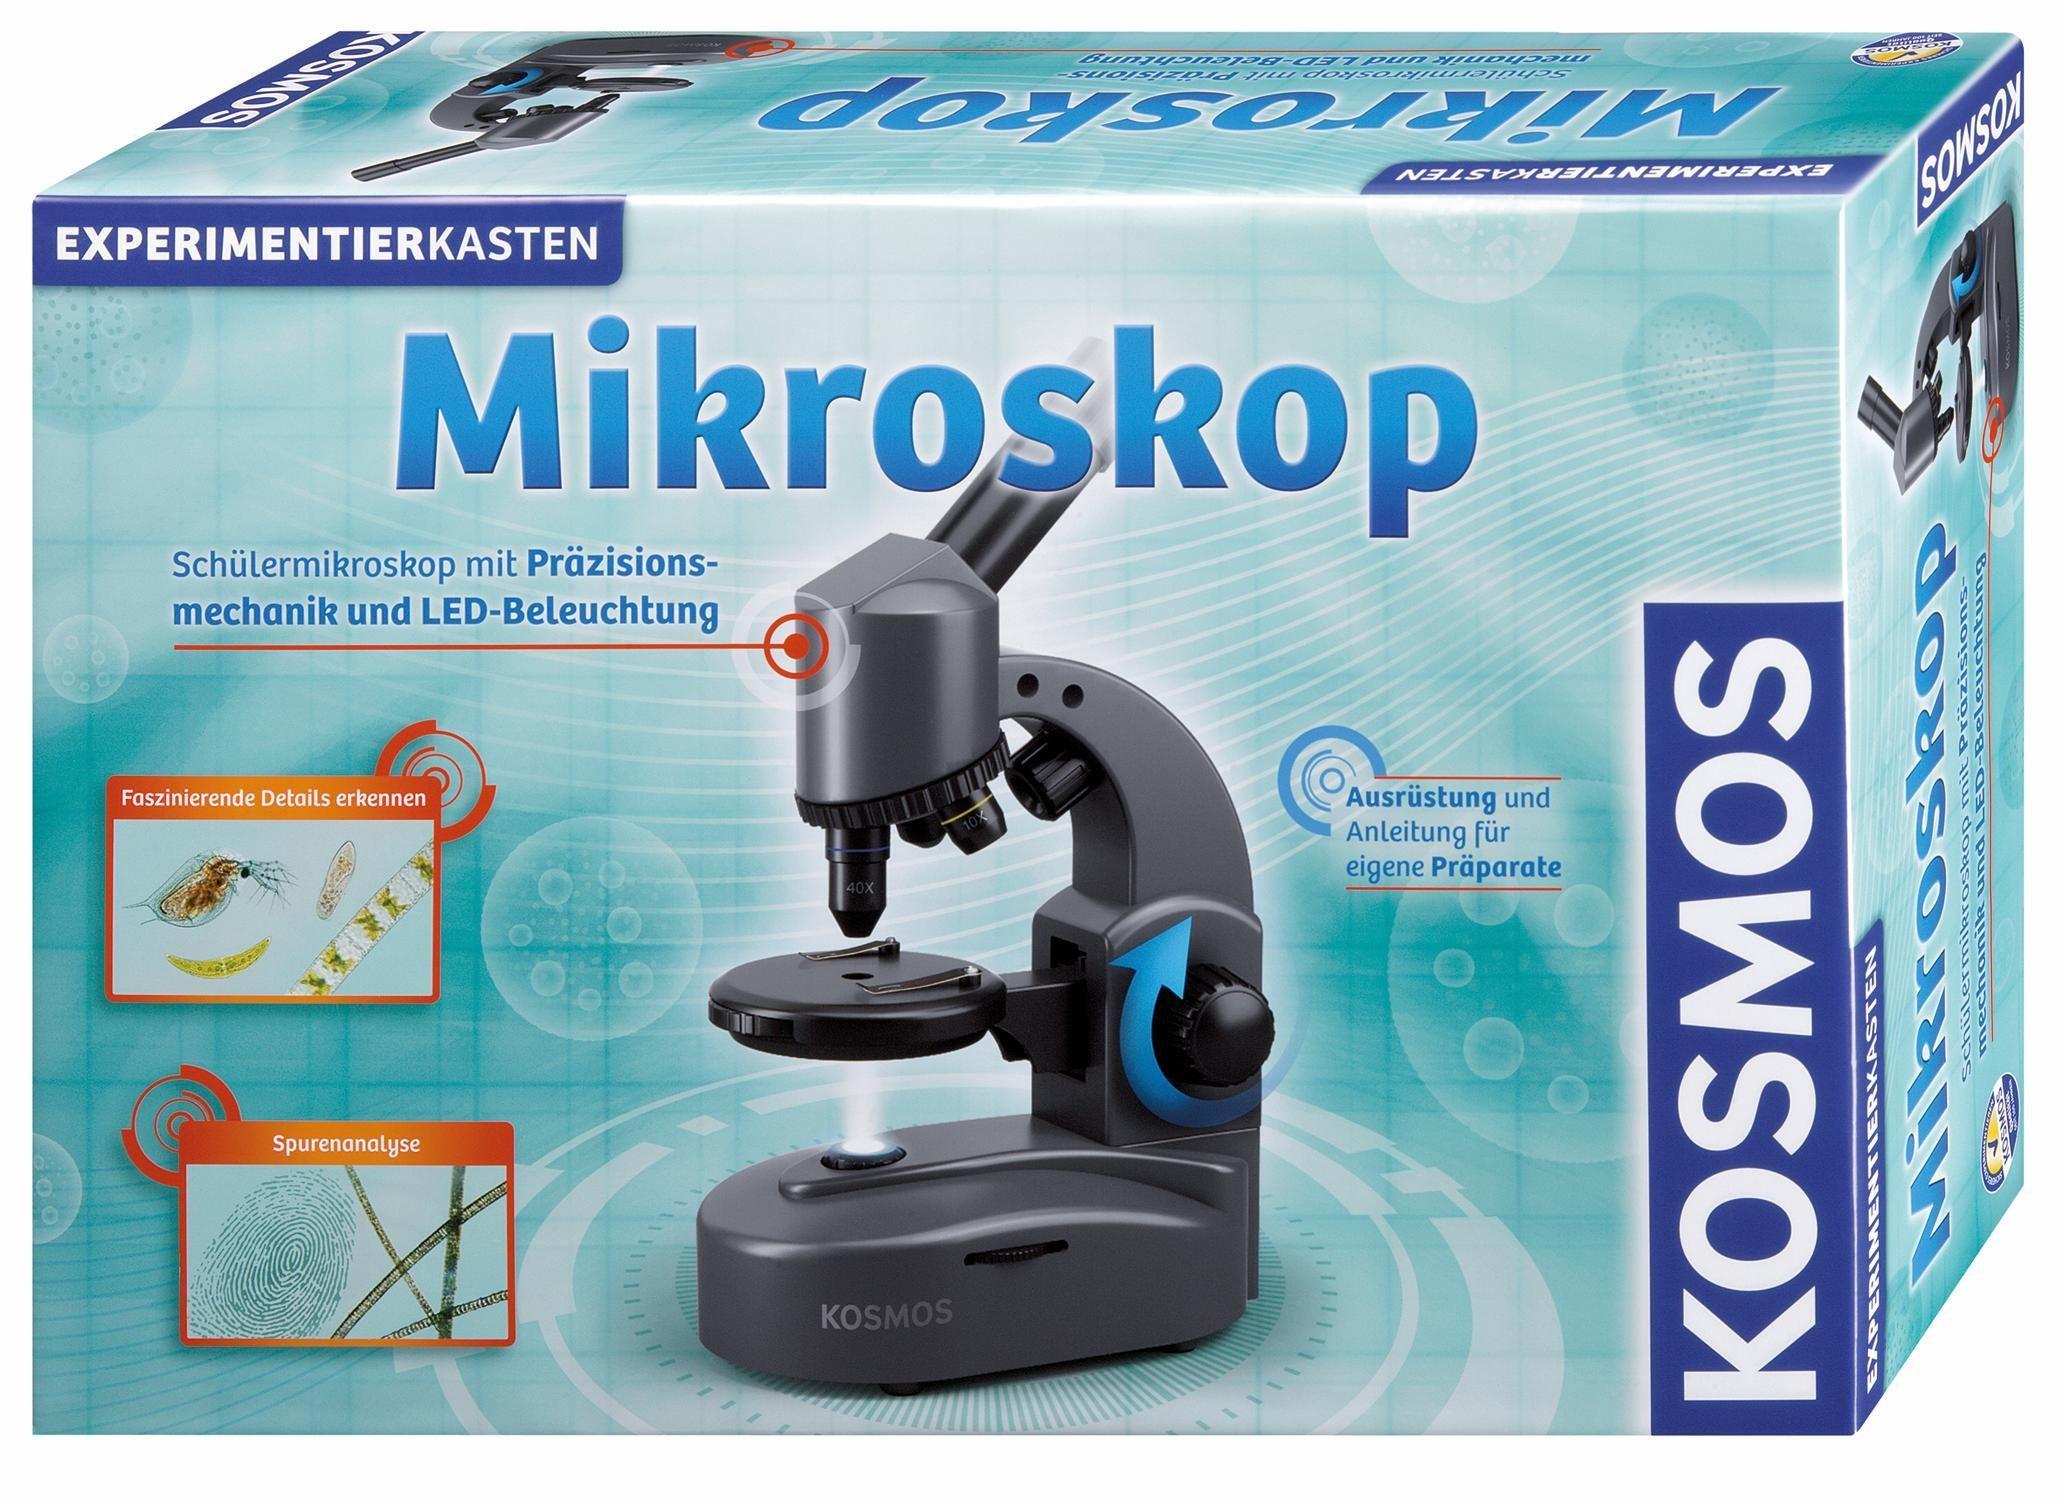 Kosmos experimentierkasten mikroskop« tlg otto